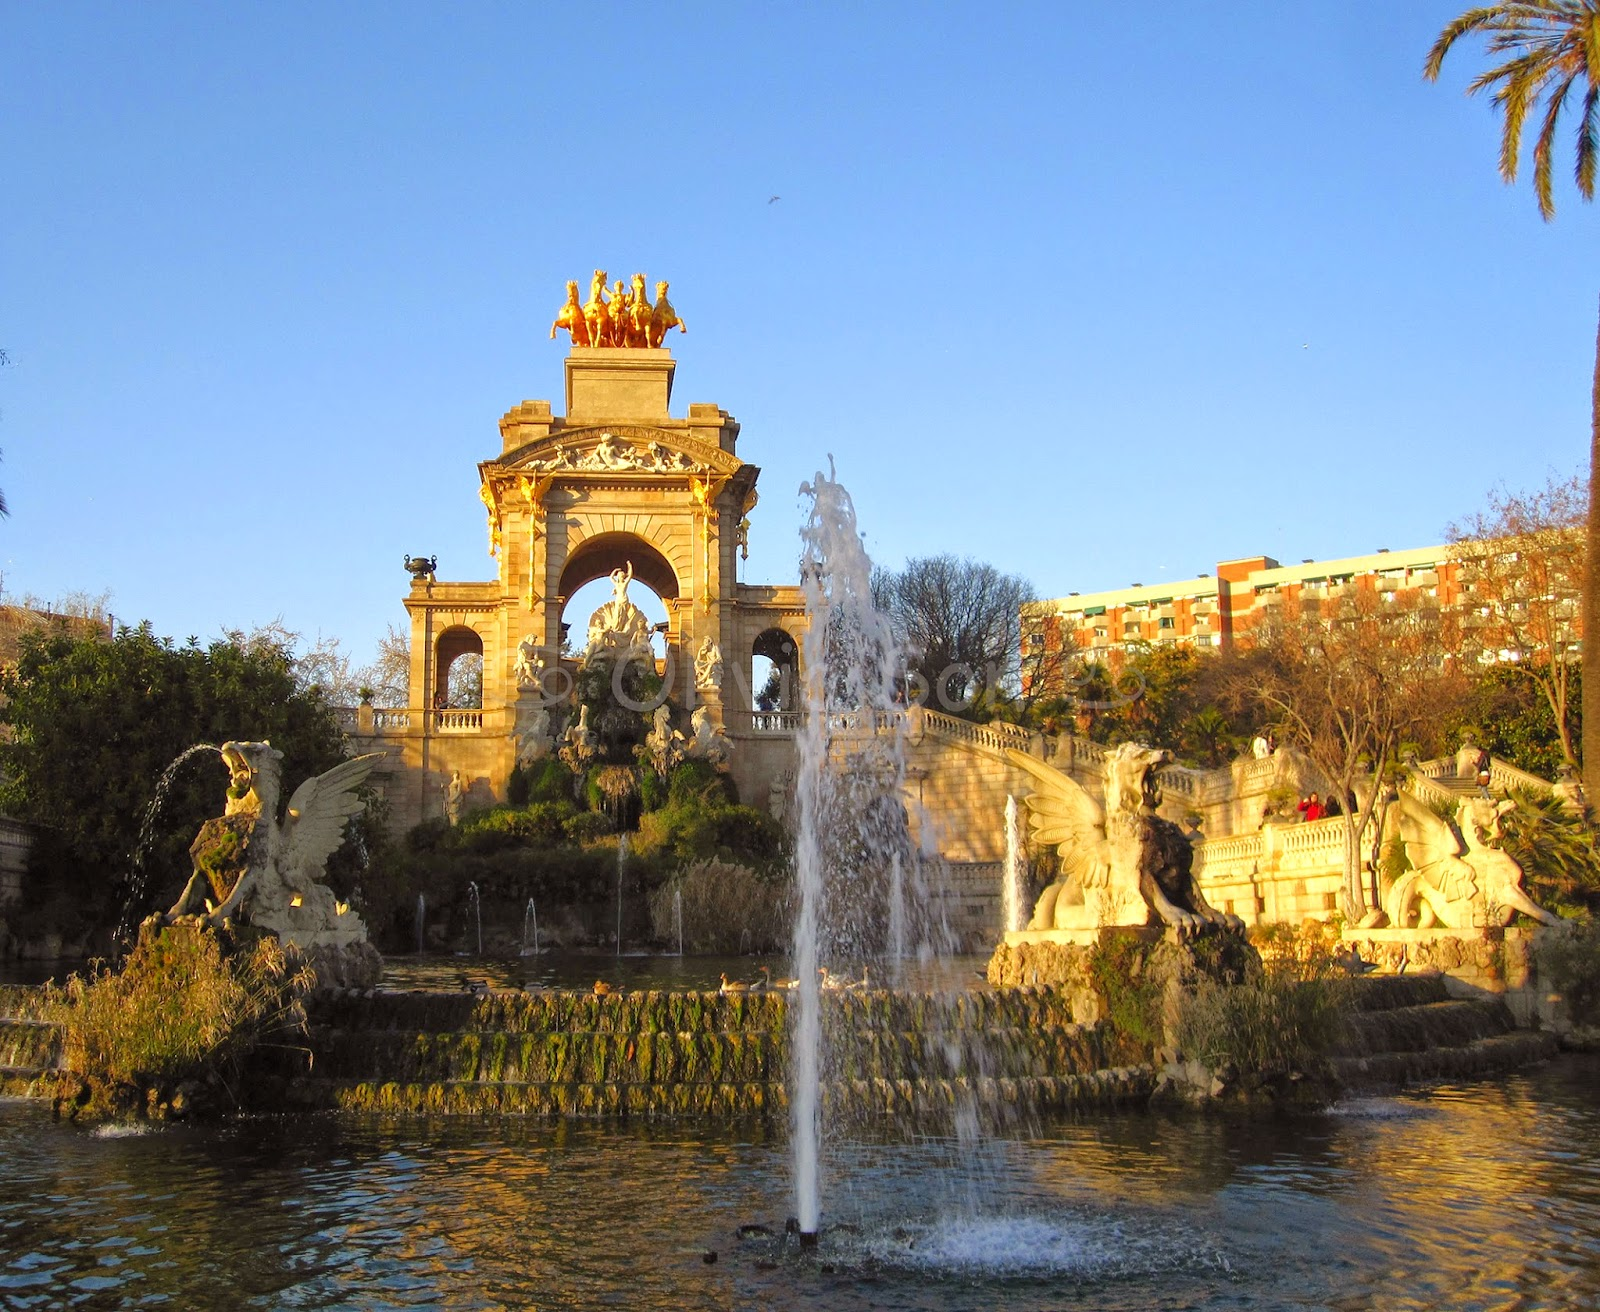 parc de la ciutadella barcelone, espagne, europe